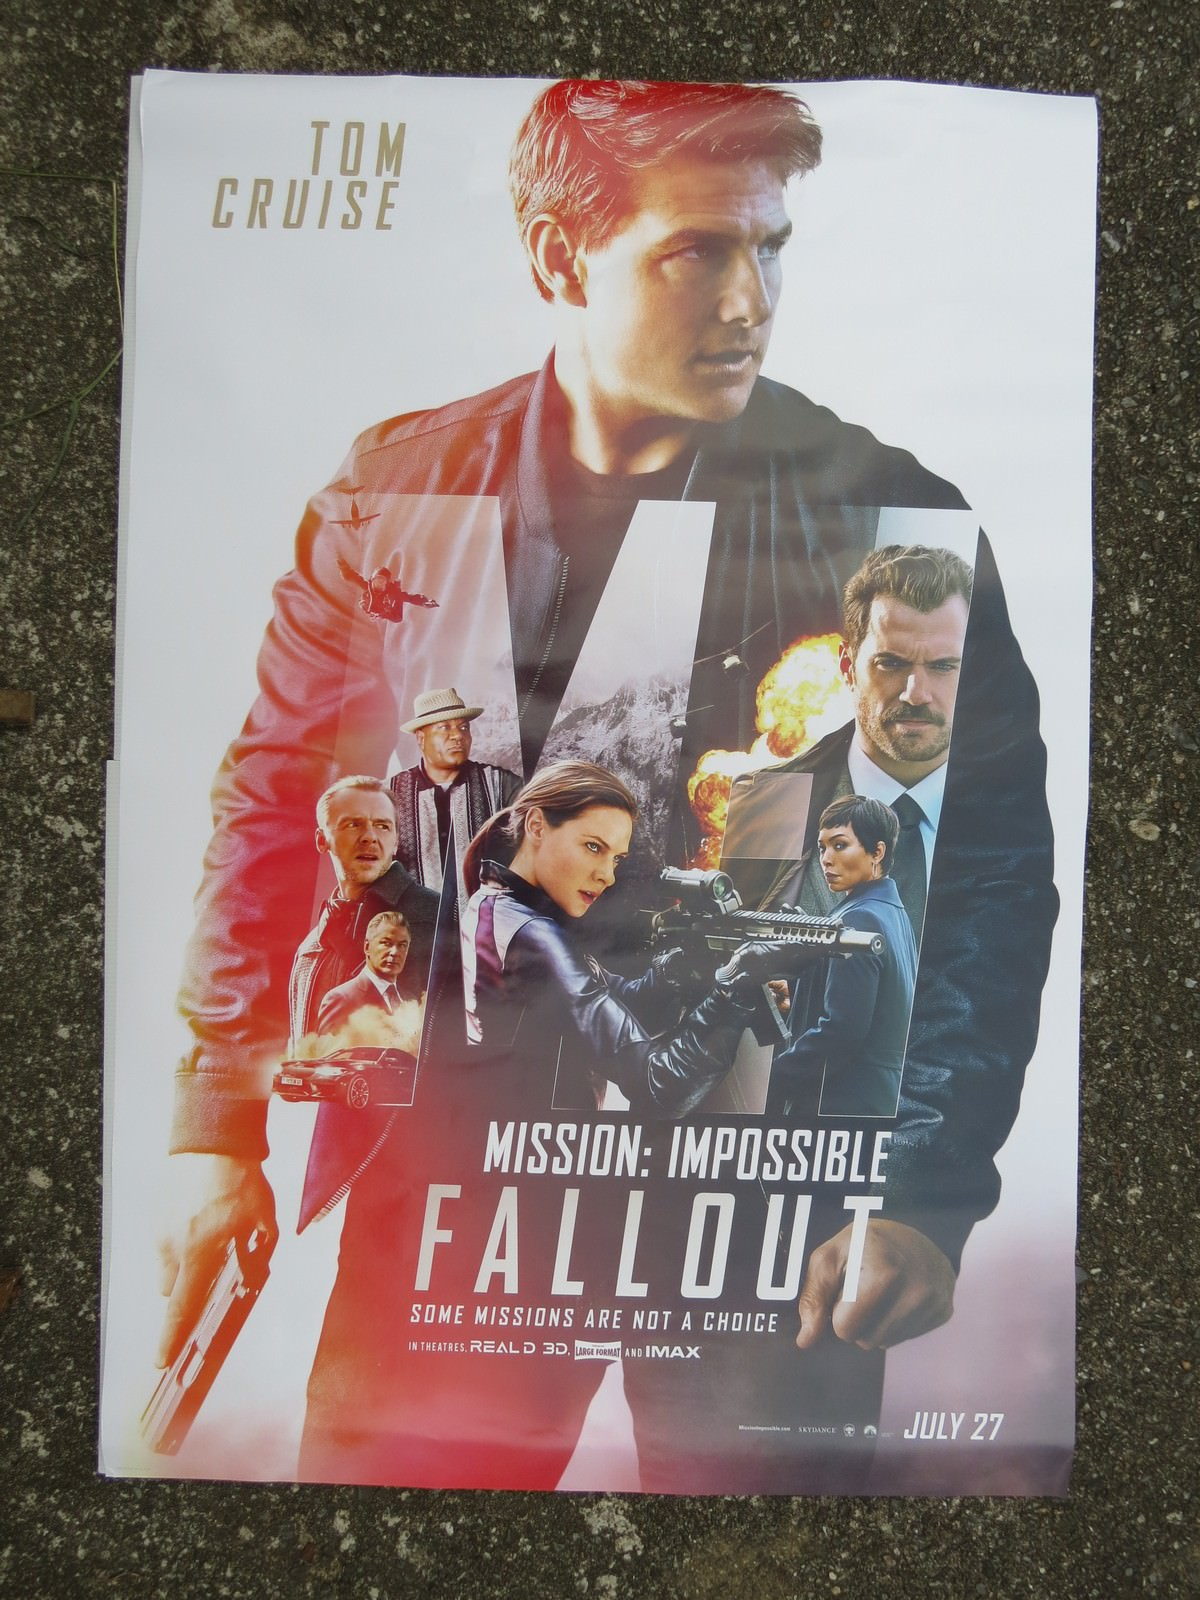 Movie, Mission: Impossible - Fallout(美國, 2018) / 不可能的任務:全面瓦解(台) / 碟中谍6:全面瓦解(中) / 職業特工隊:叛逆之謎(港), 實體海報